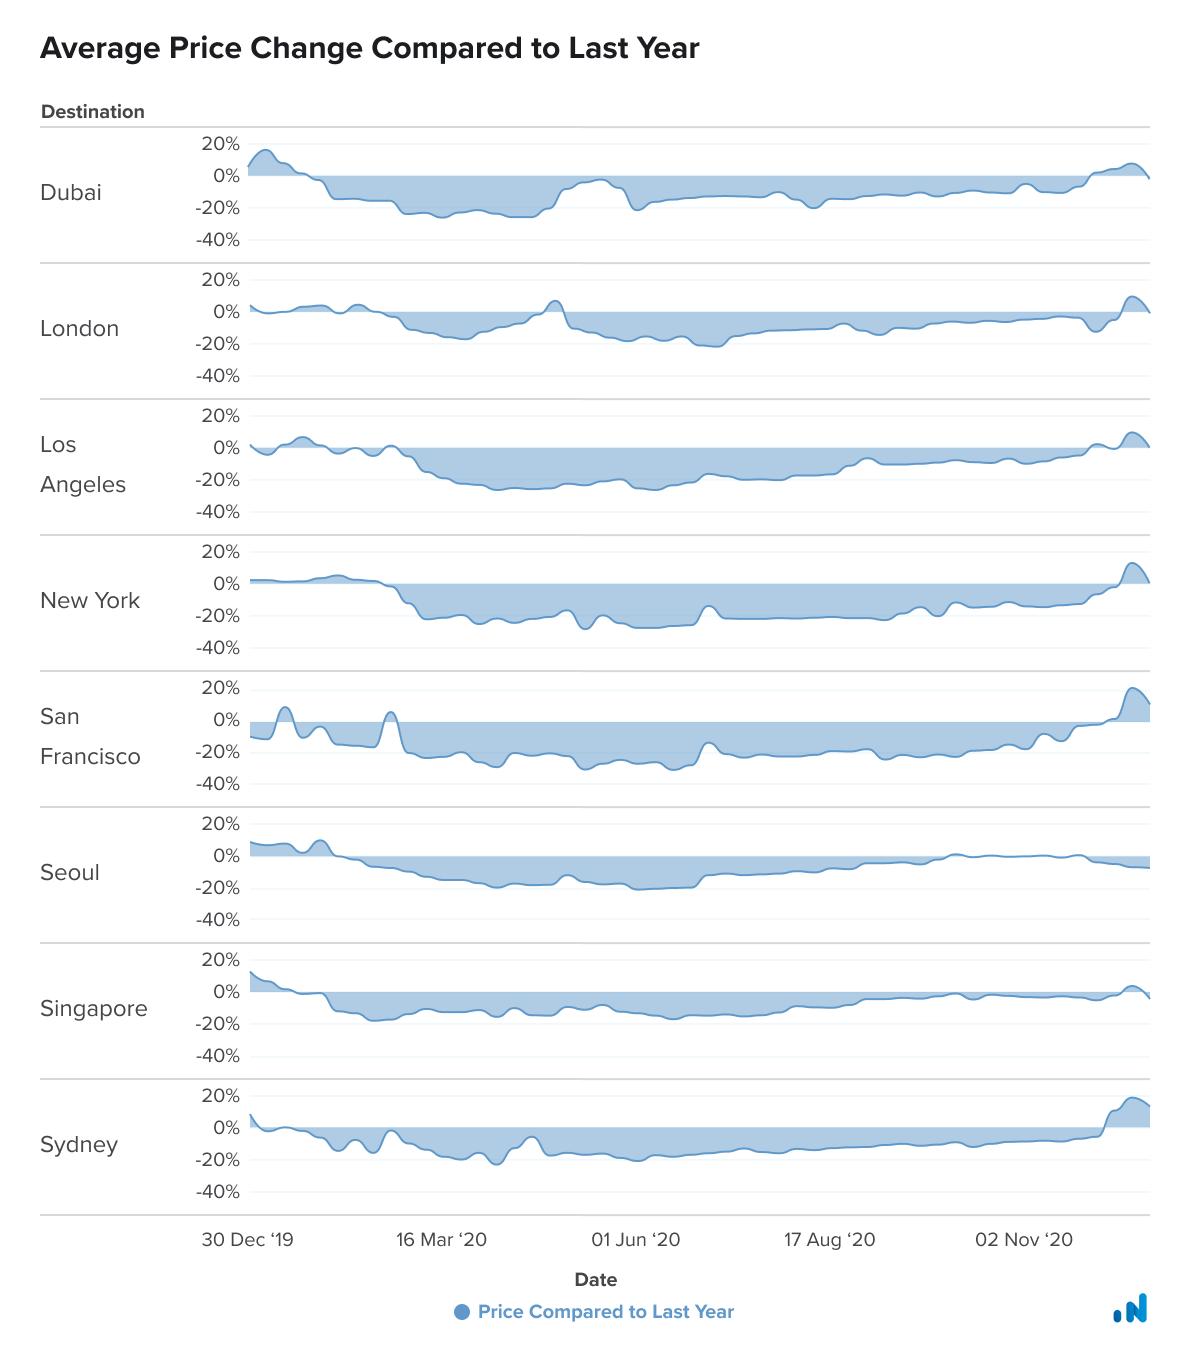 Average Price Change Graph